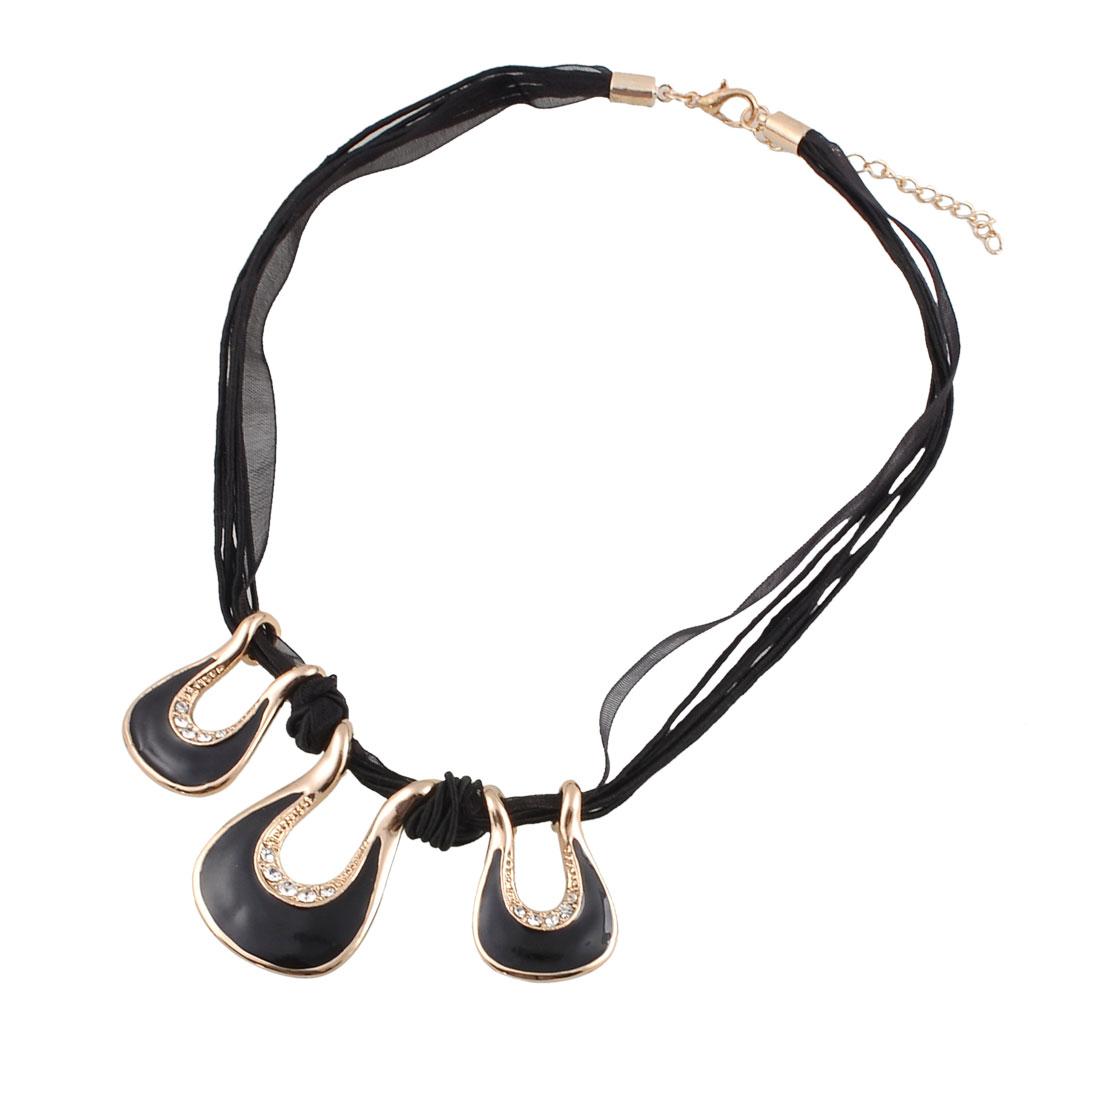 Rhinestone Decor Handbang Pendant Black Nylon String Necklace for Women